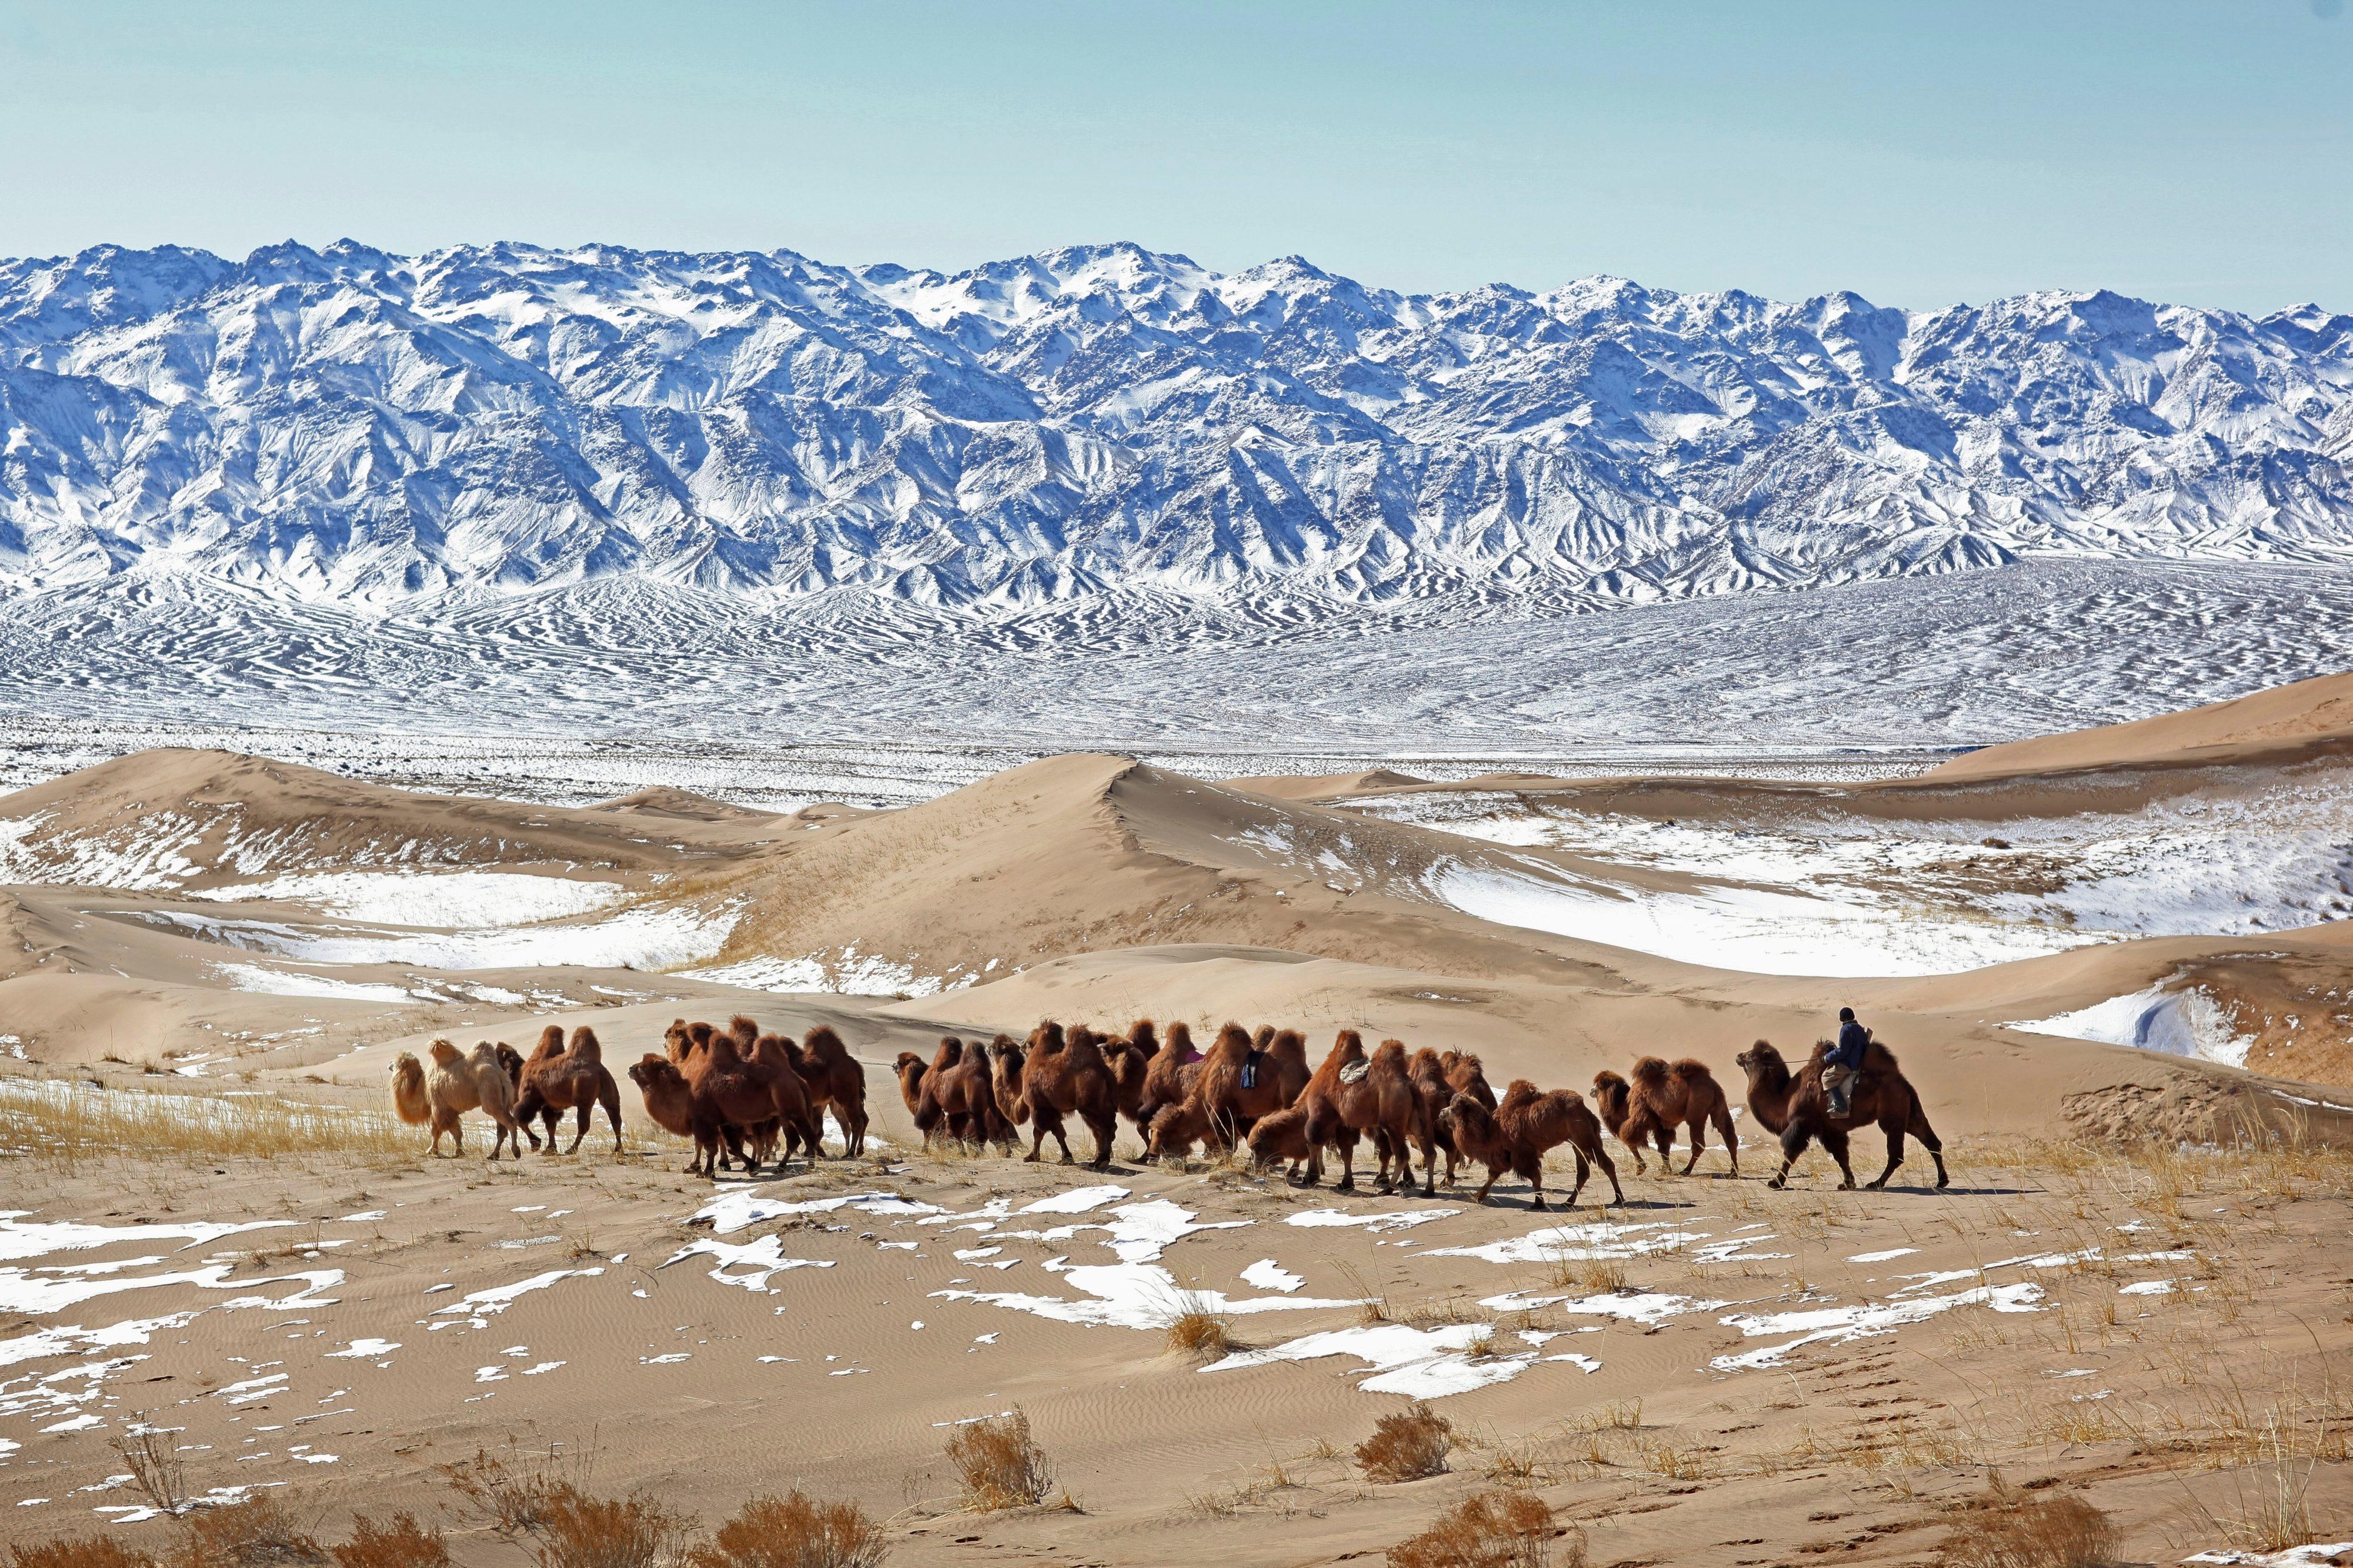 Nomad corrals caravan of camels across Gobi Desert